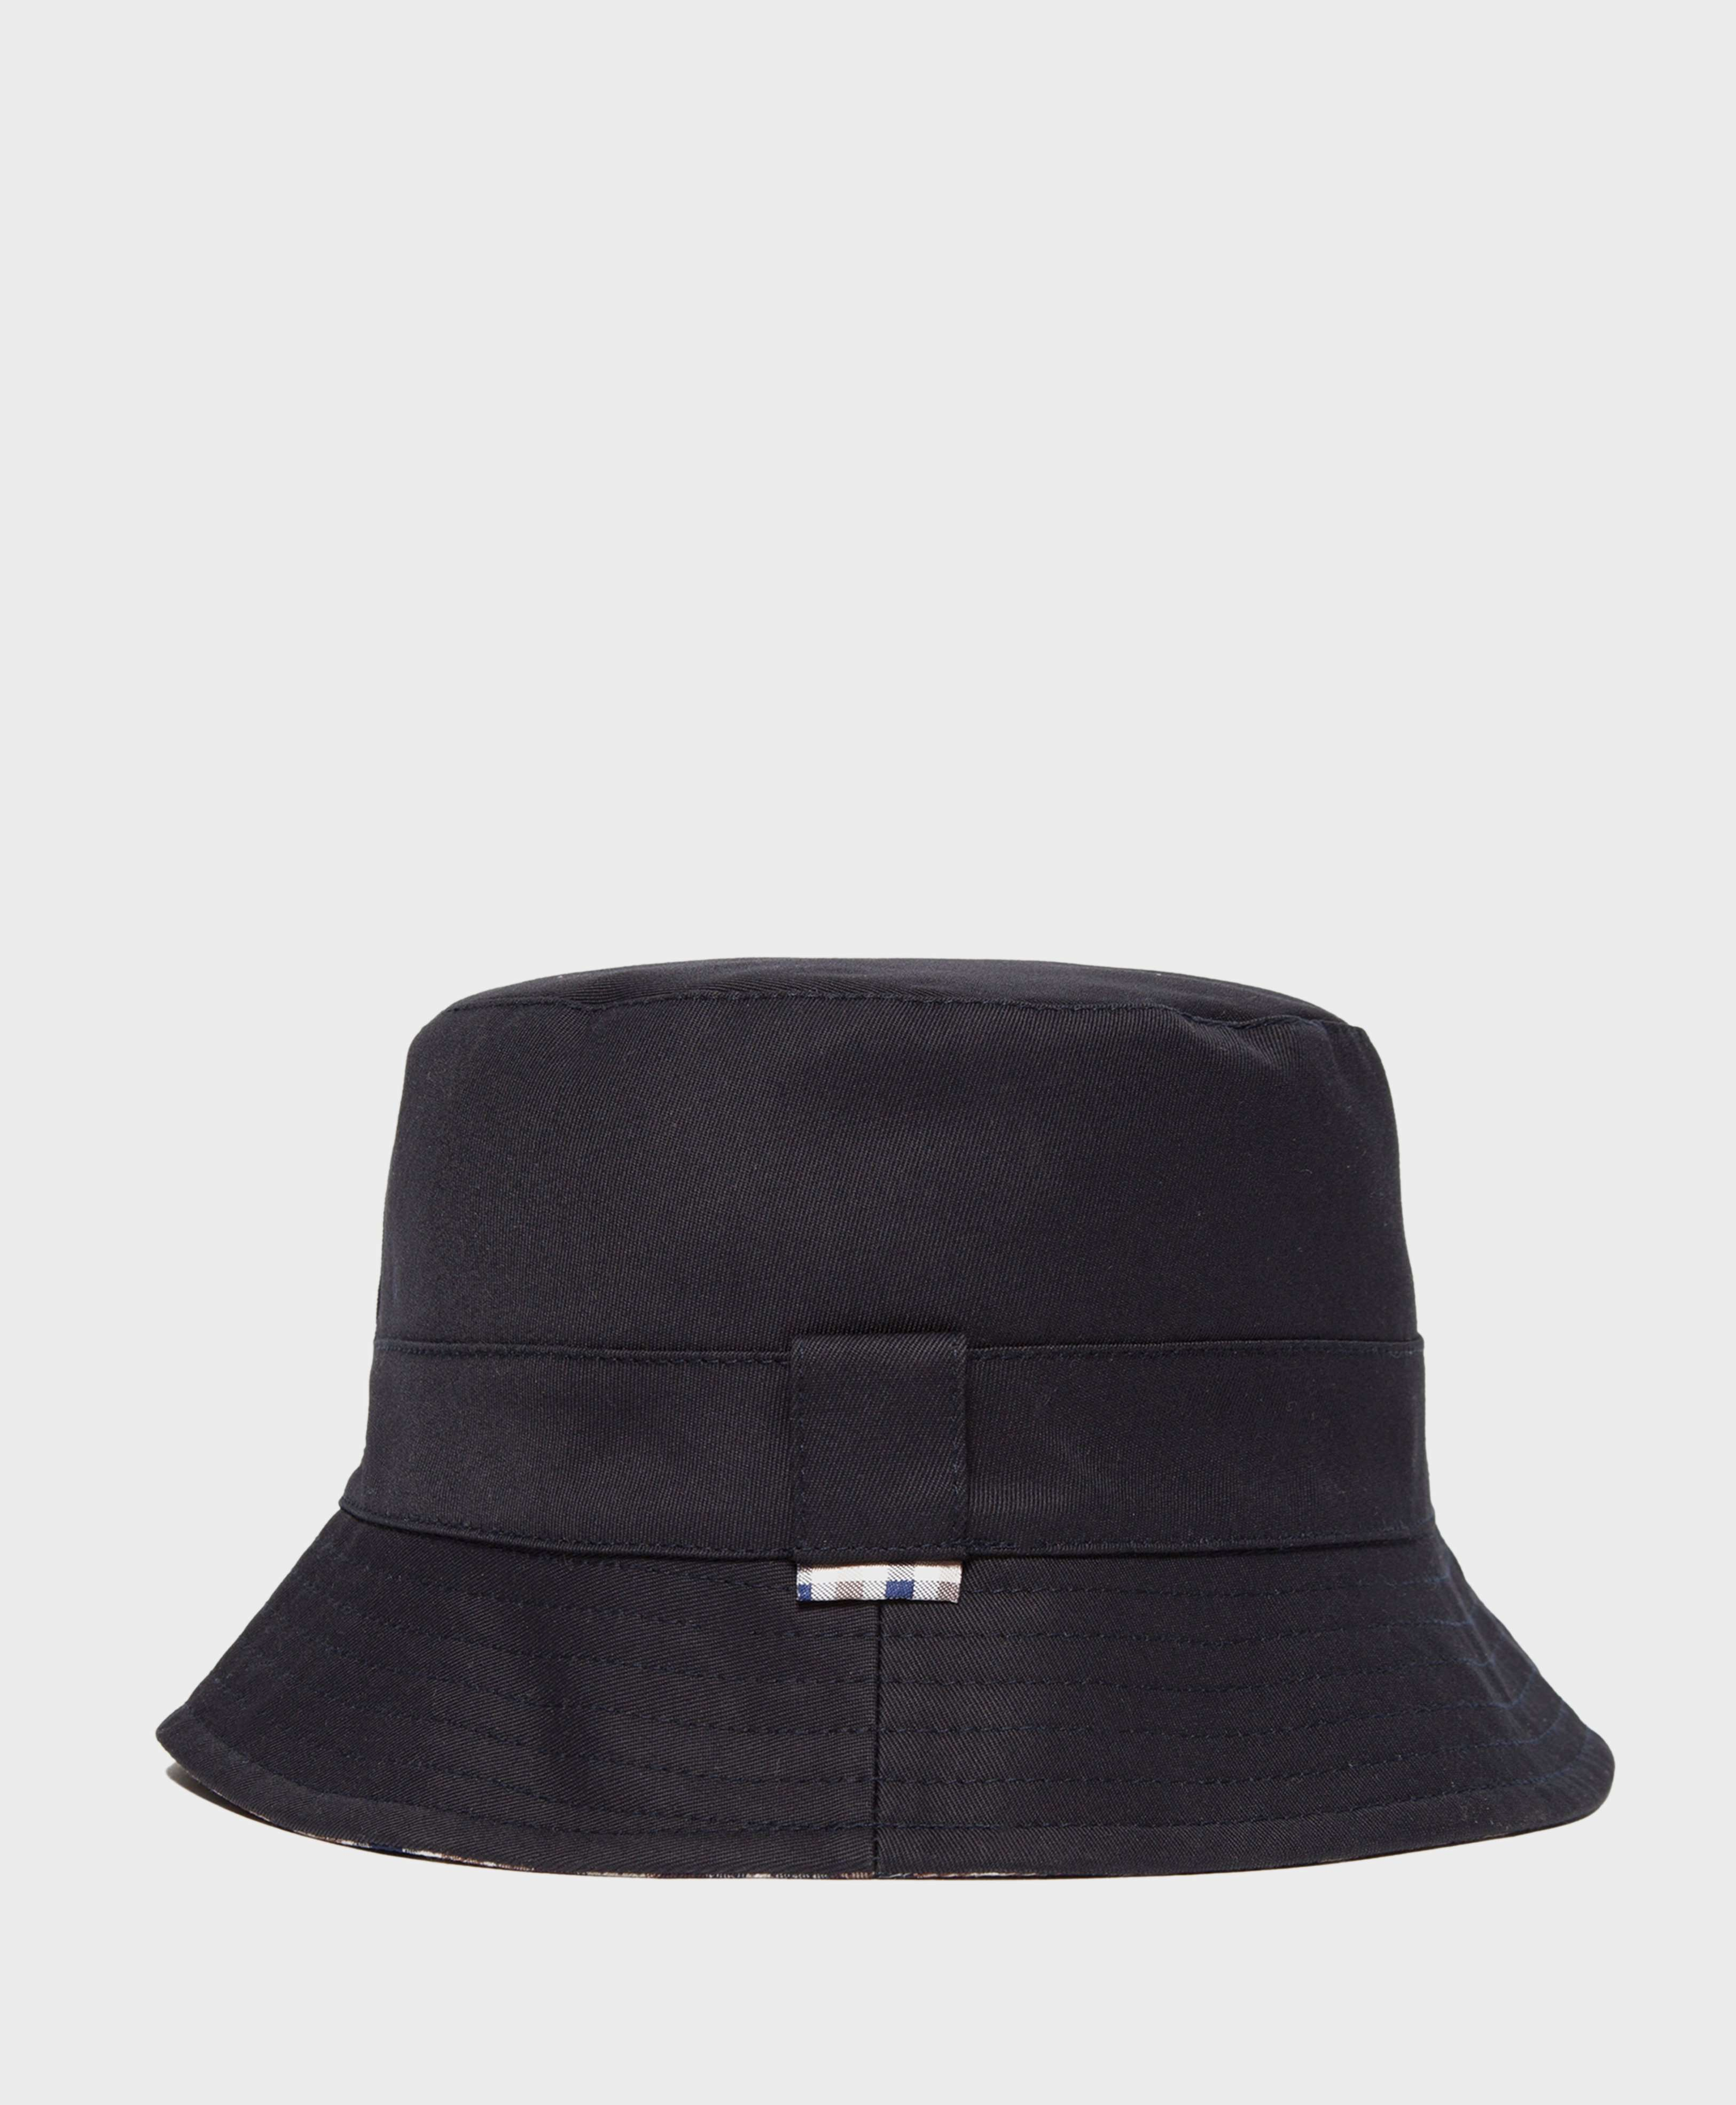 ef047542cbb Aquascutum Reversible House Check Bucket Hat